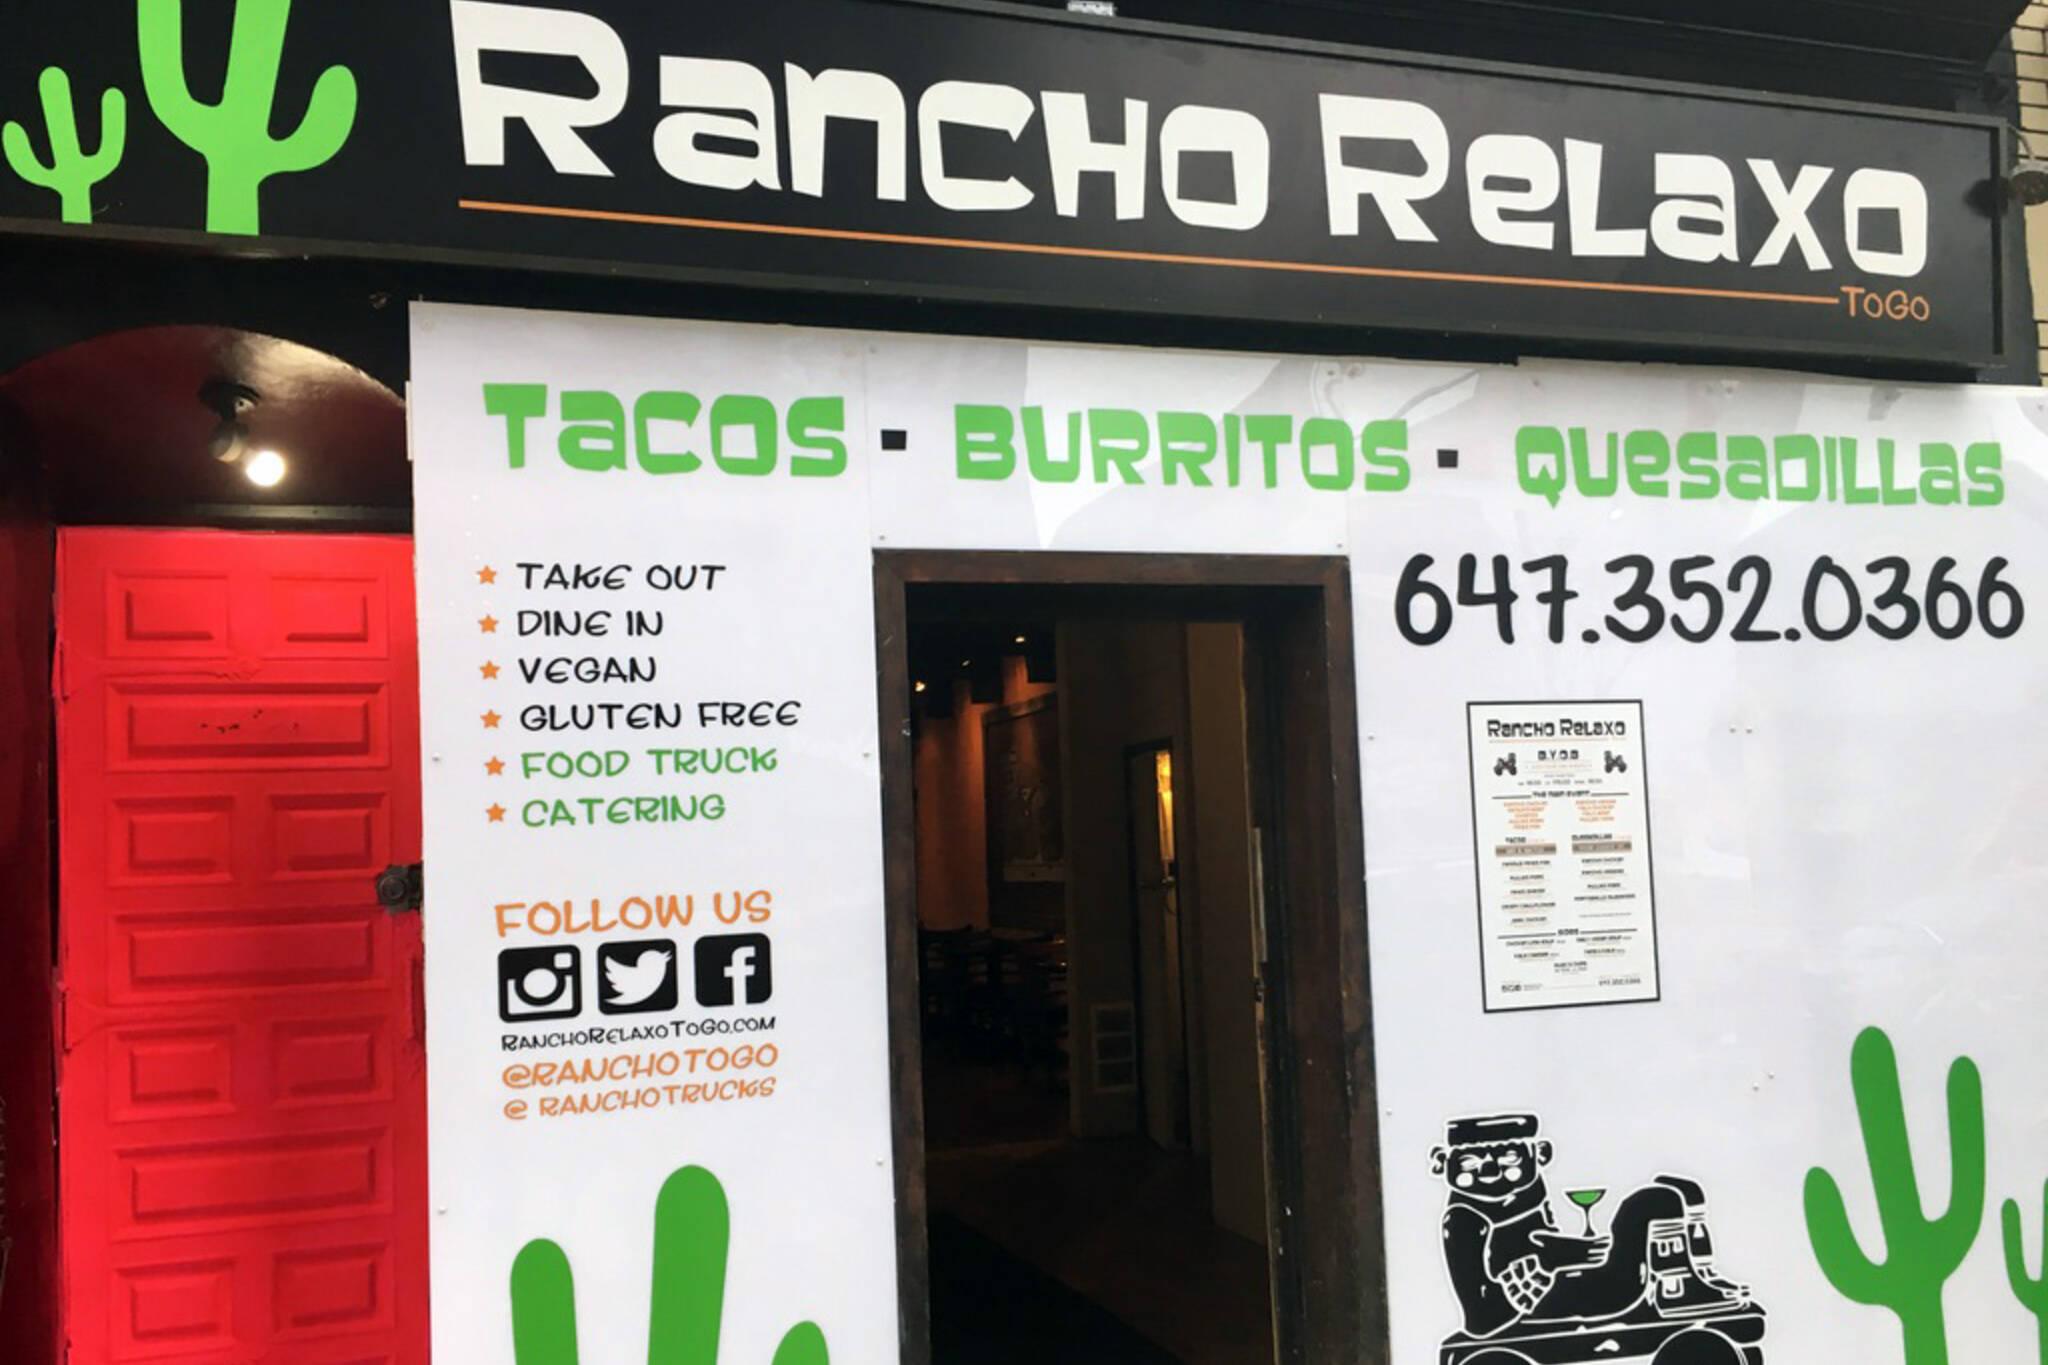 Rancho Relaxo Toronto